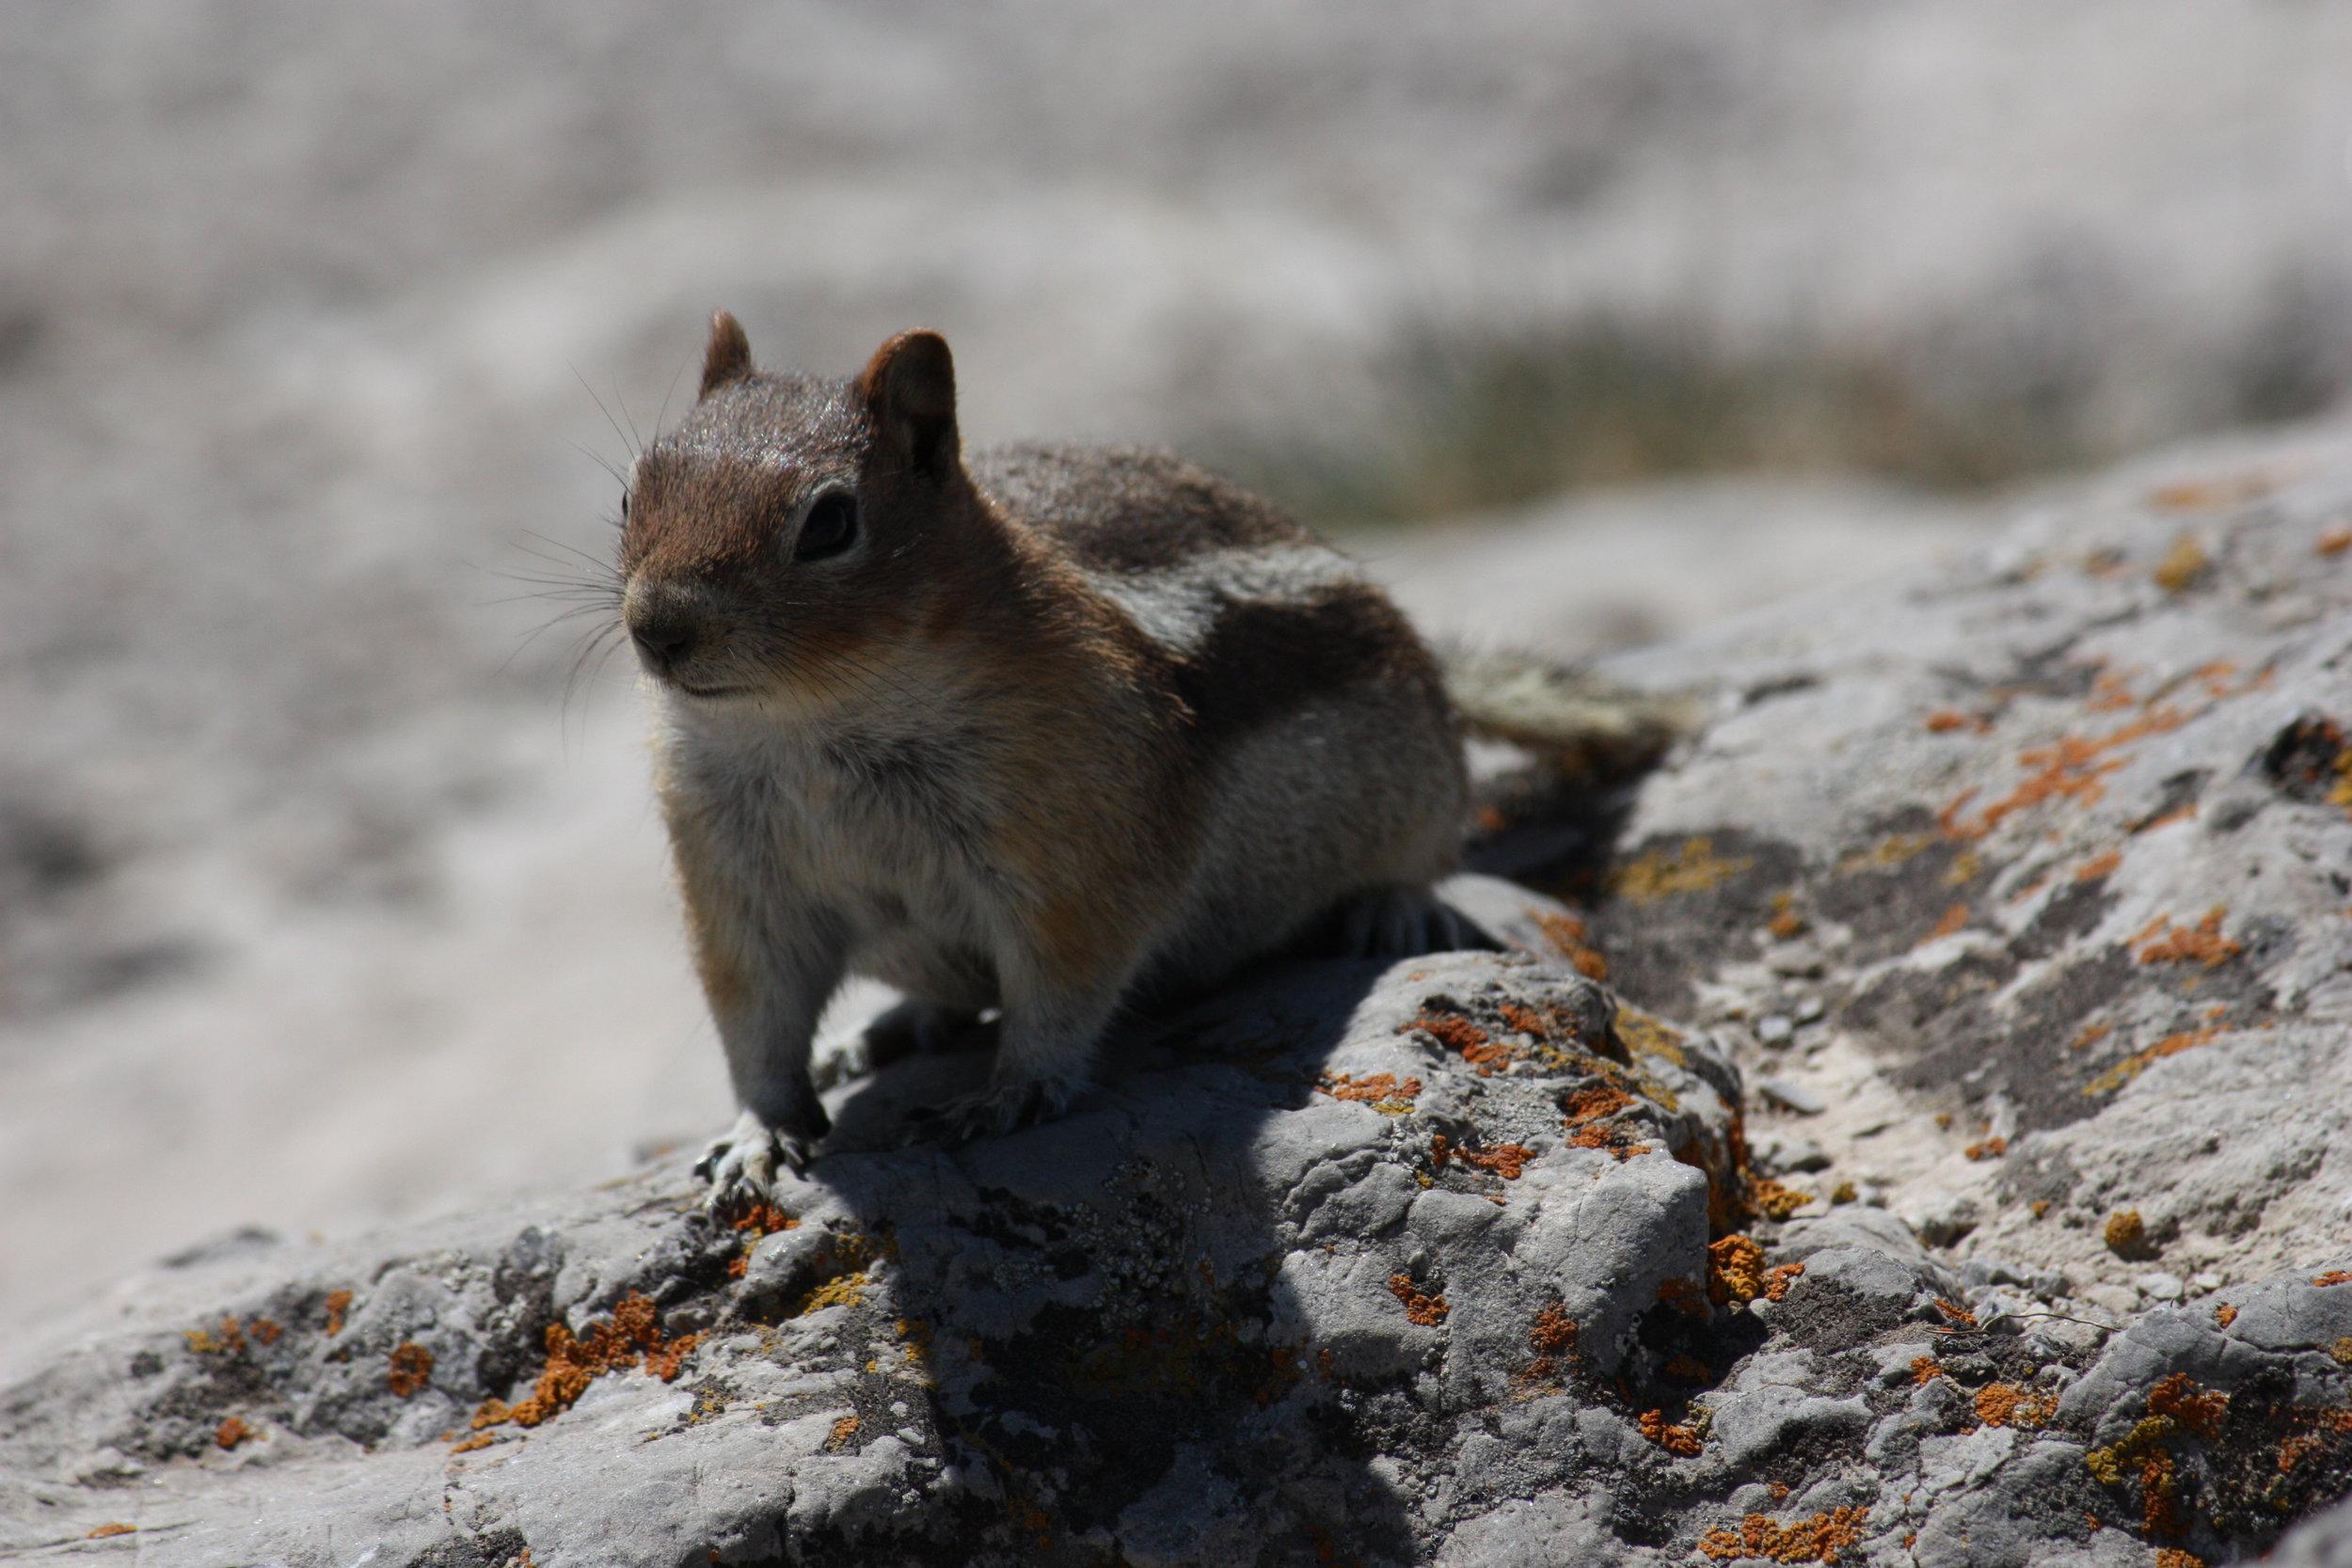 golden-mantled-ground-squirrel-callospermophilus-lateralis_25785926200_o.jpg